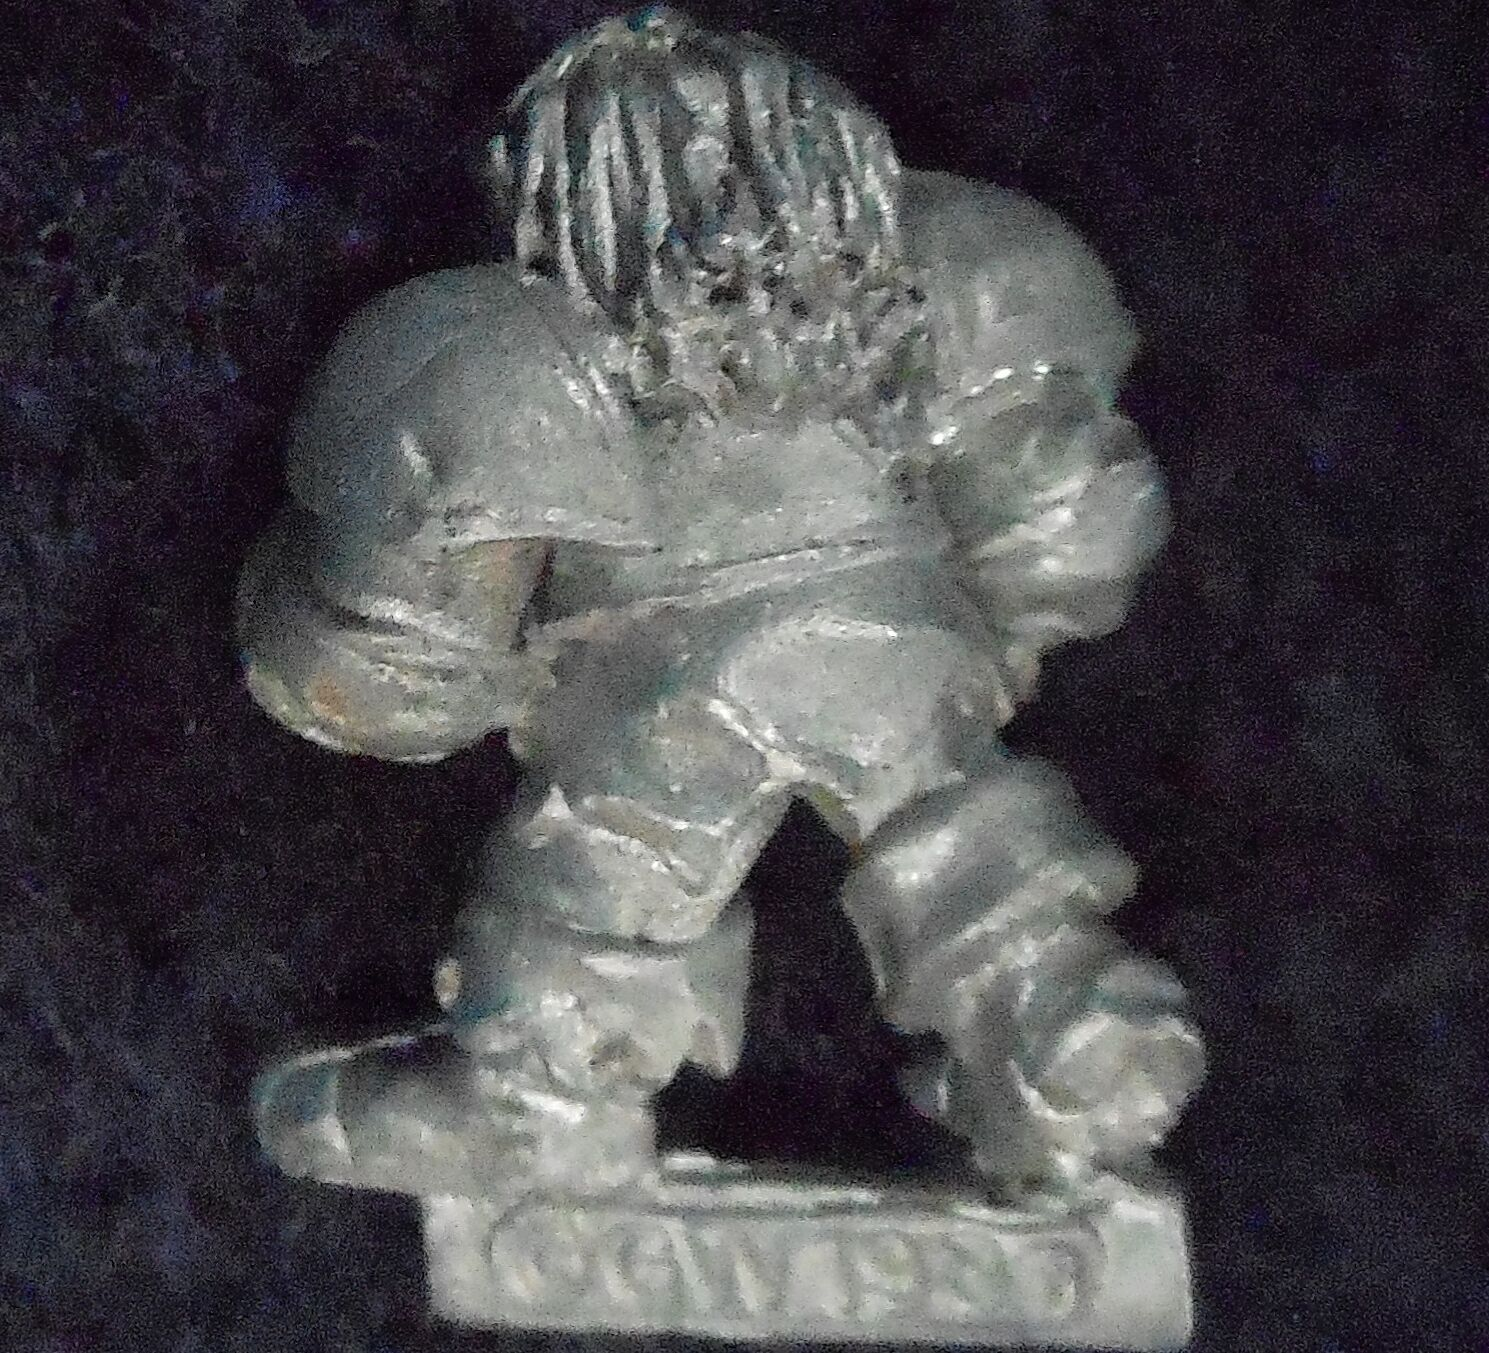 1989 Chaos Dwarf Bloodbowl 2nd Edition Player 4 Citadel Fantasy Football Lineman